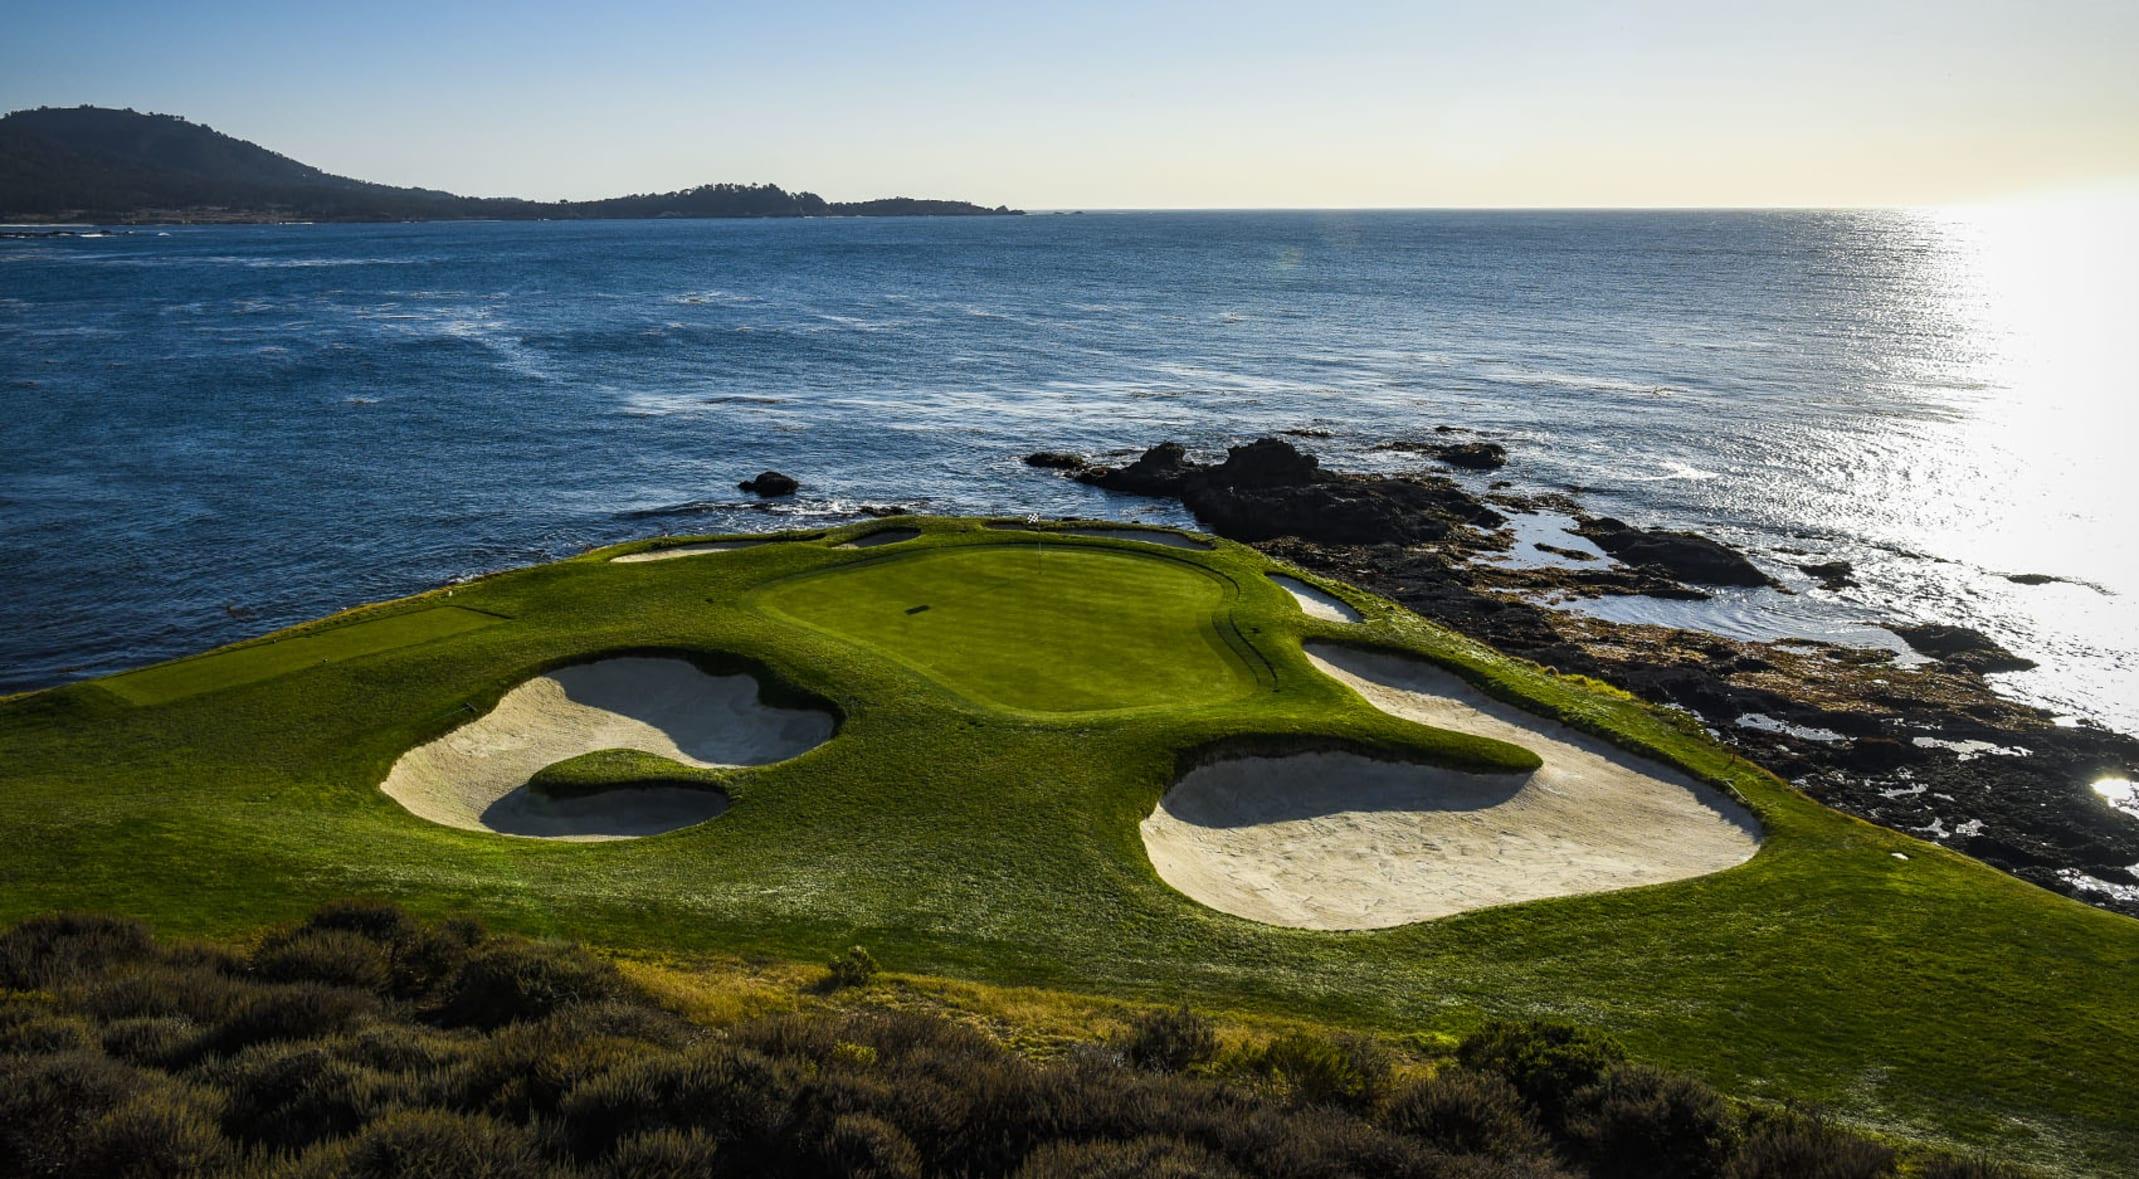 Pebble Beach Golf Club - The Social Golfer v2